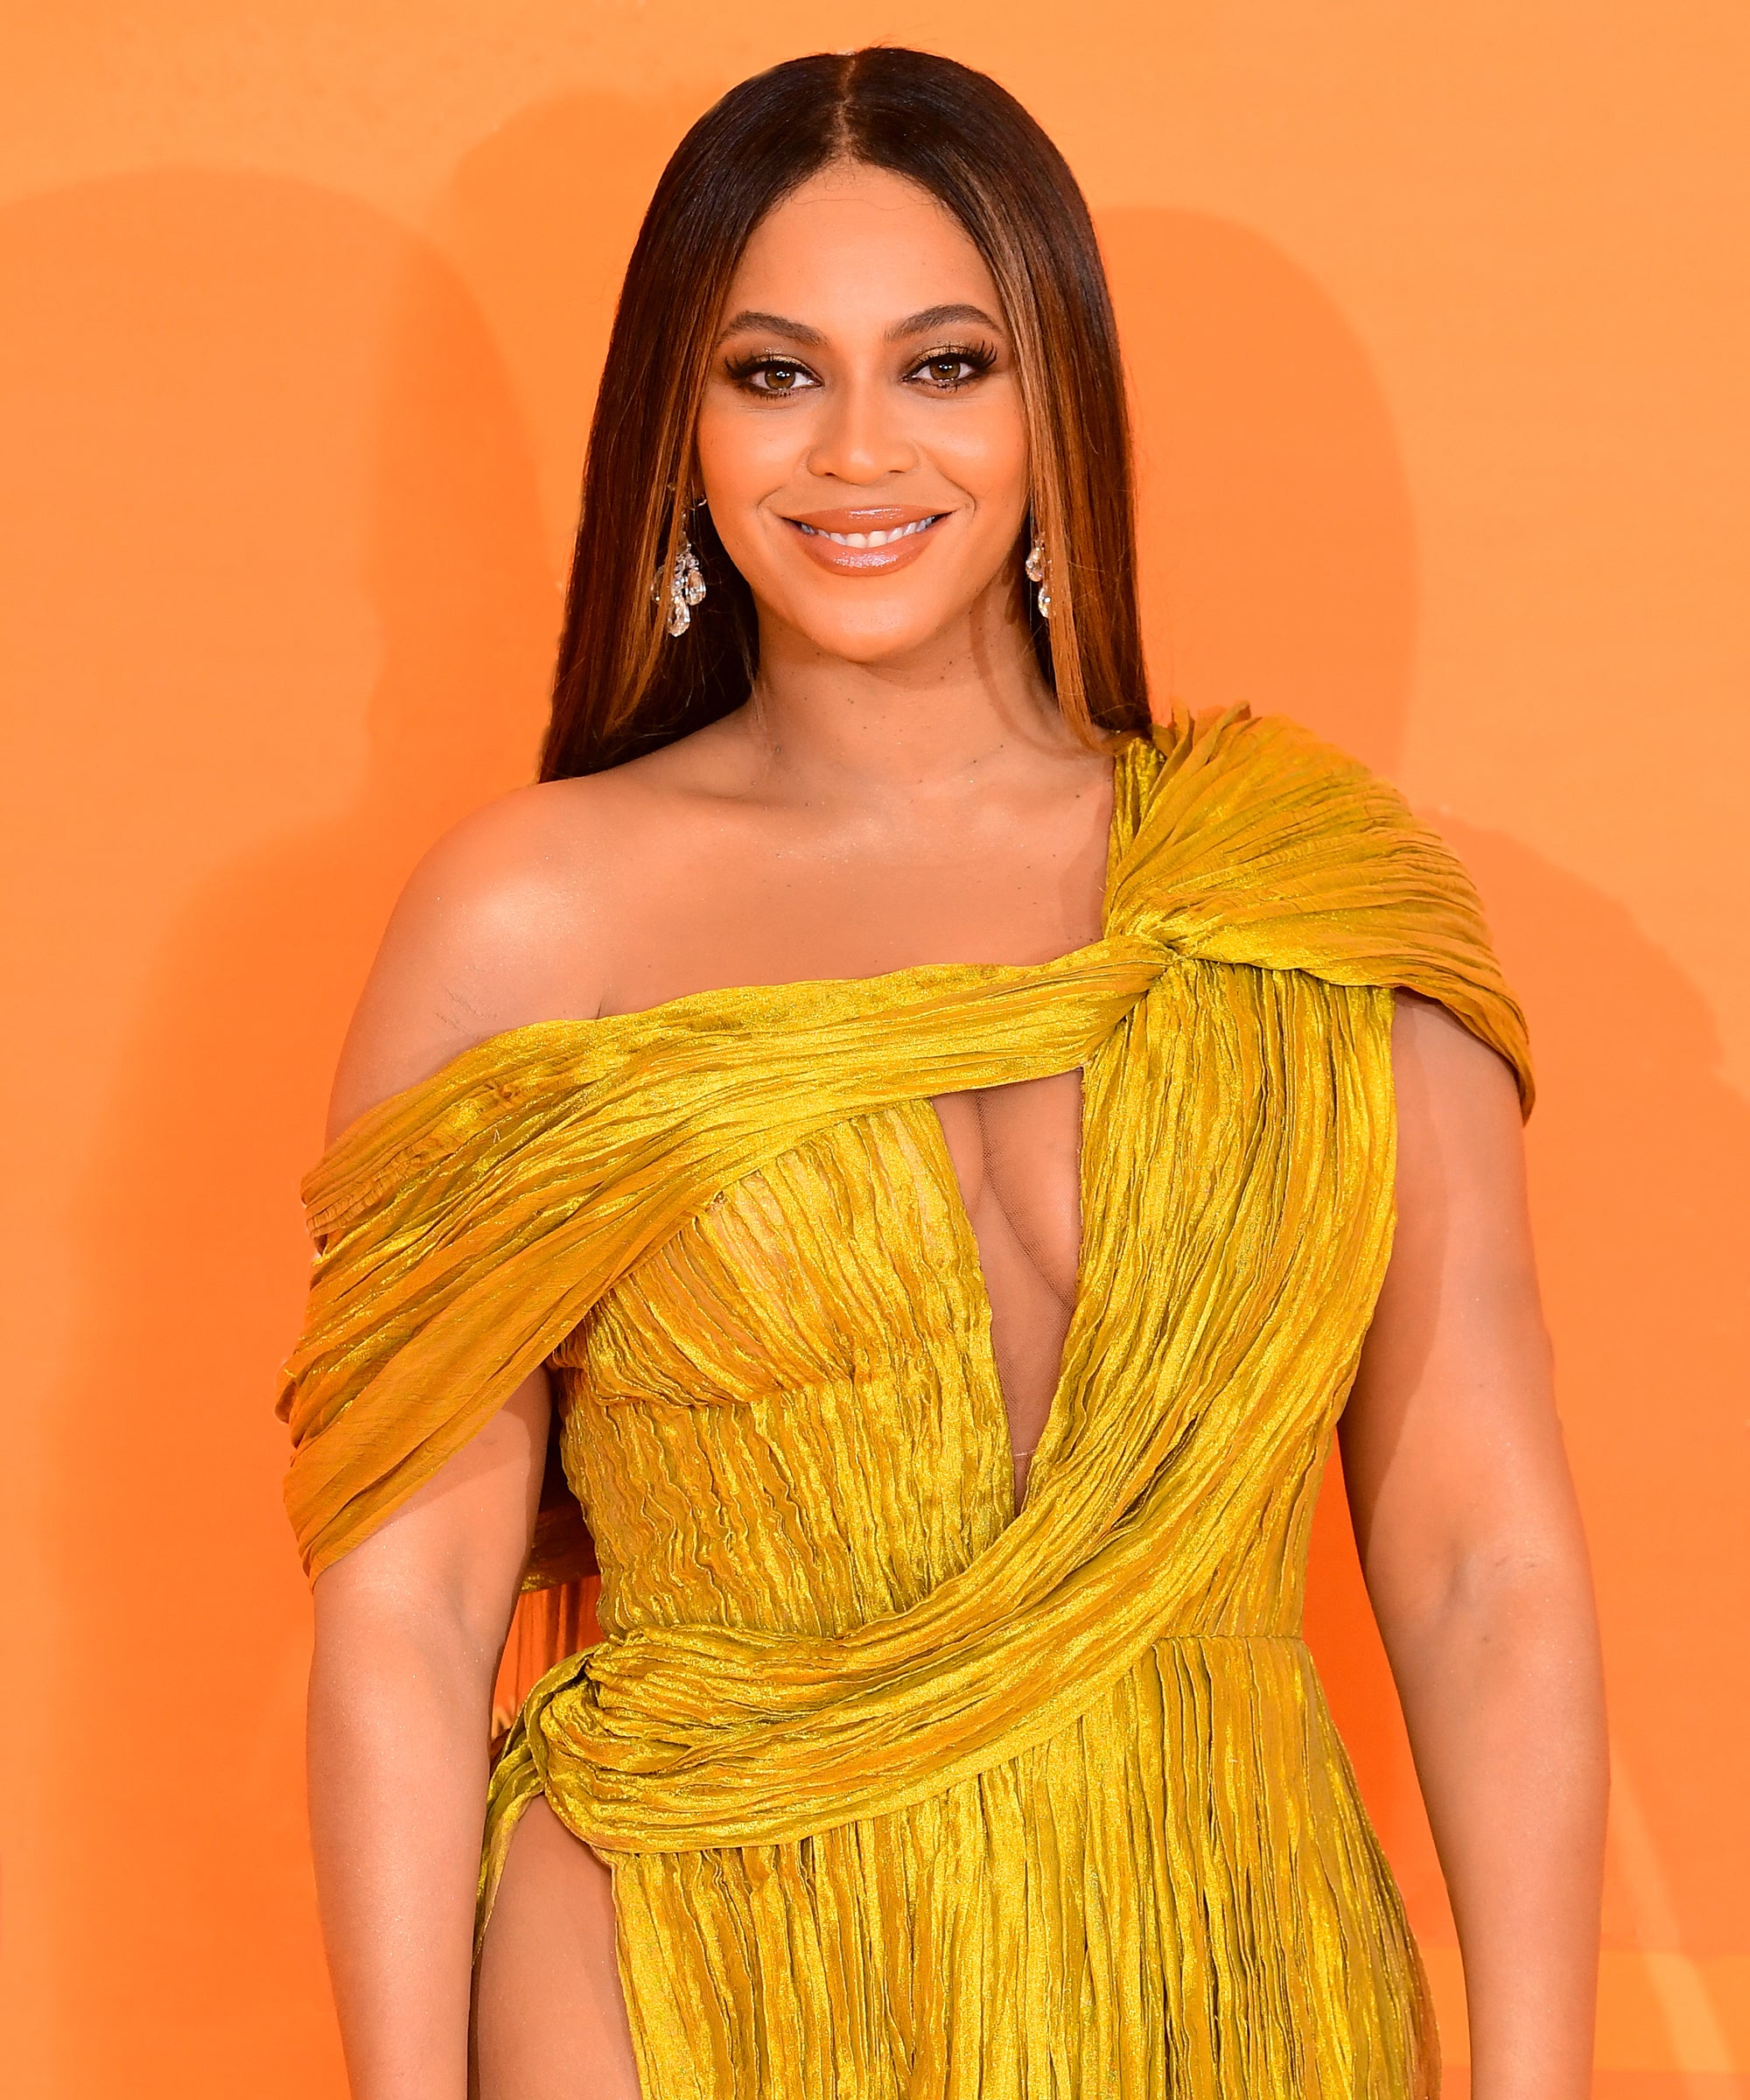 Bow Down To Beyoncé's Workout & Diet Routine